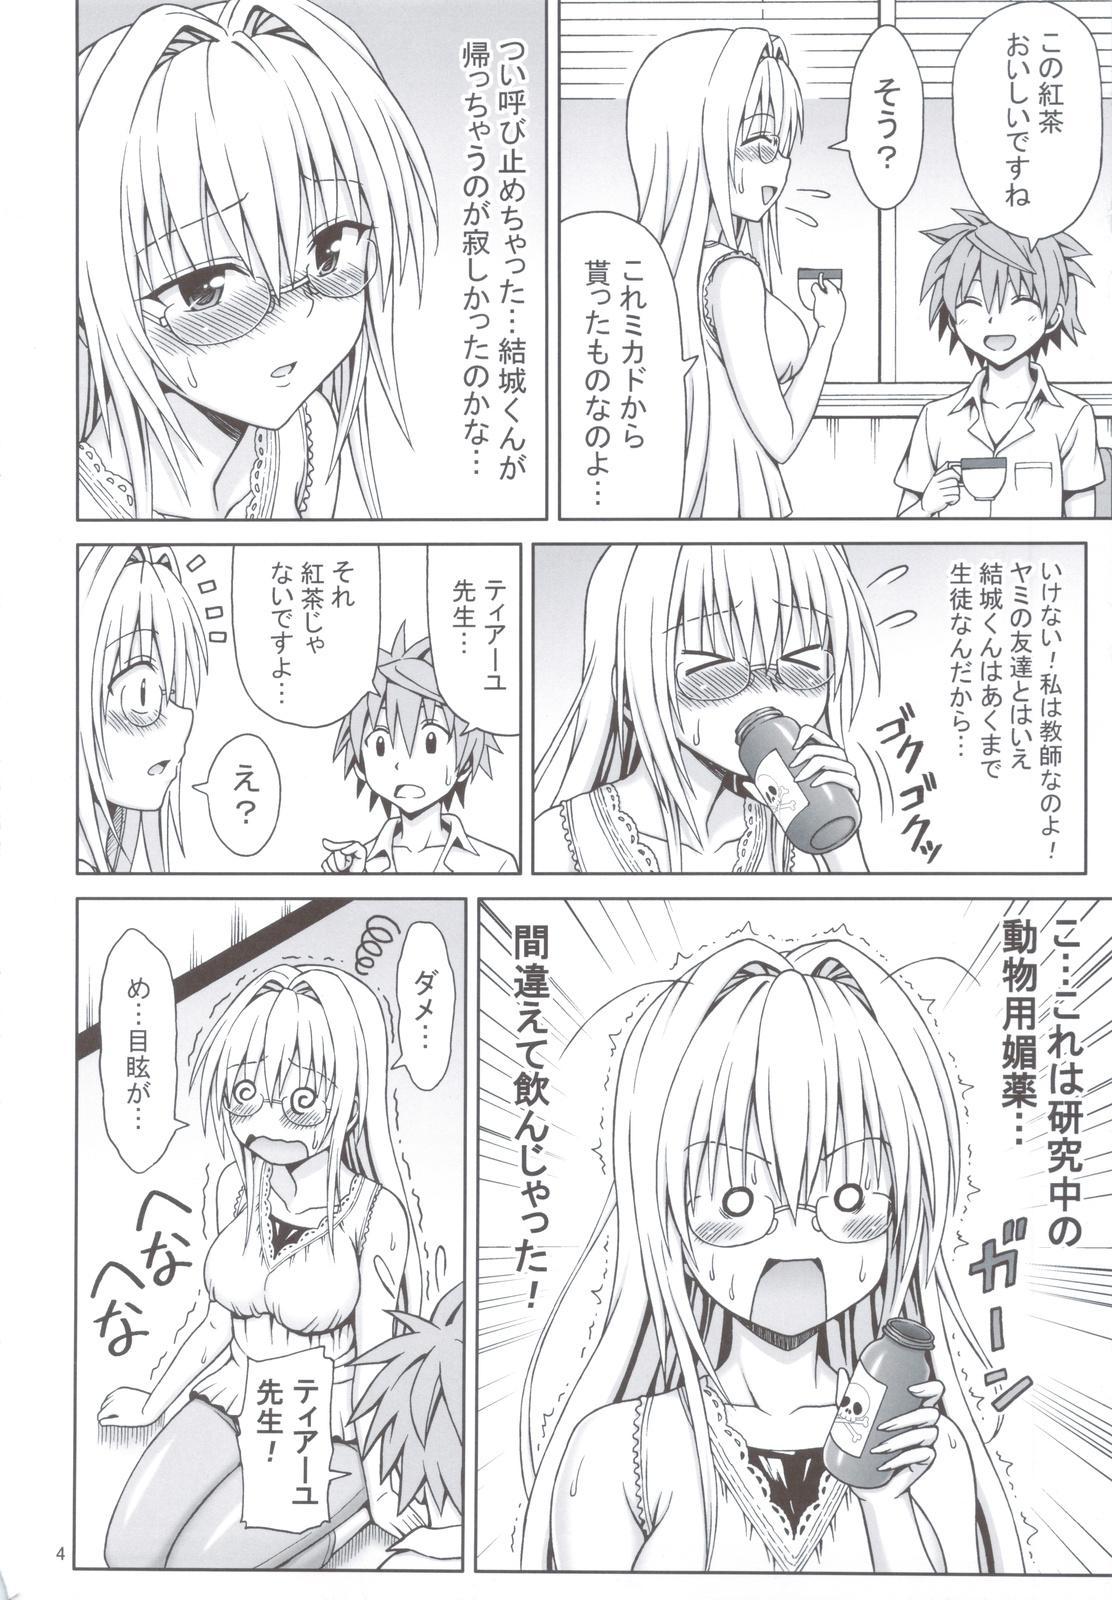 Tearju Sensei no Houkago Trouble 2